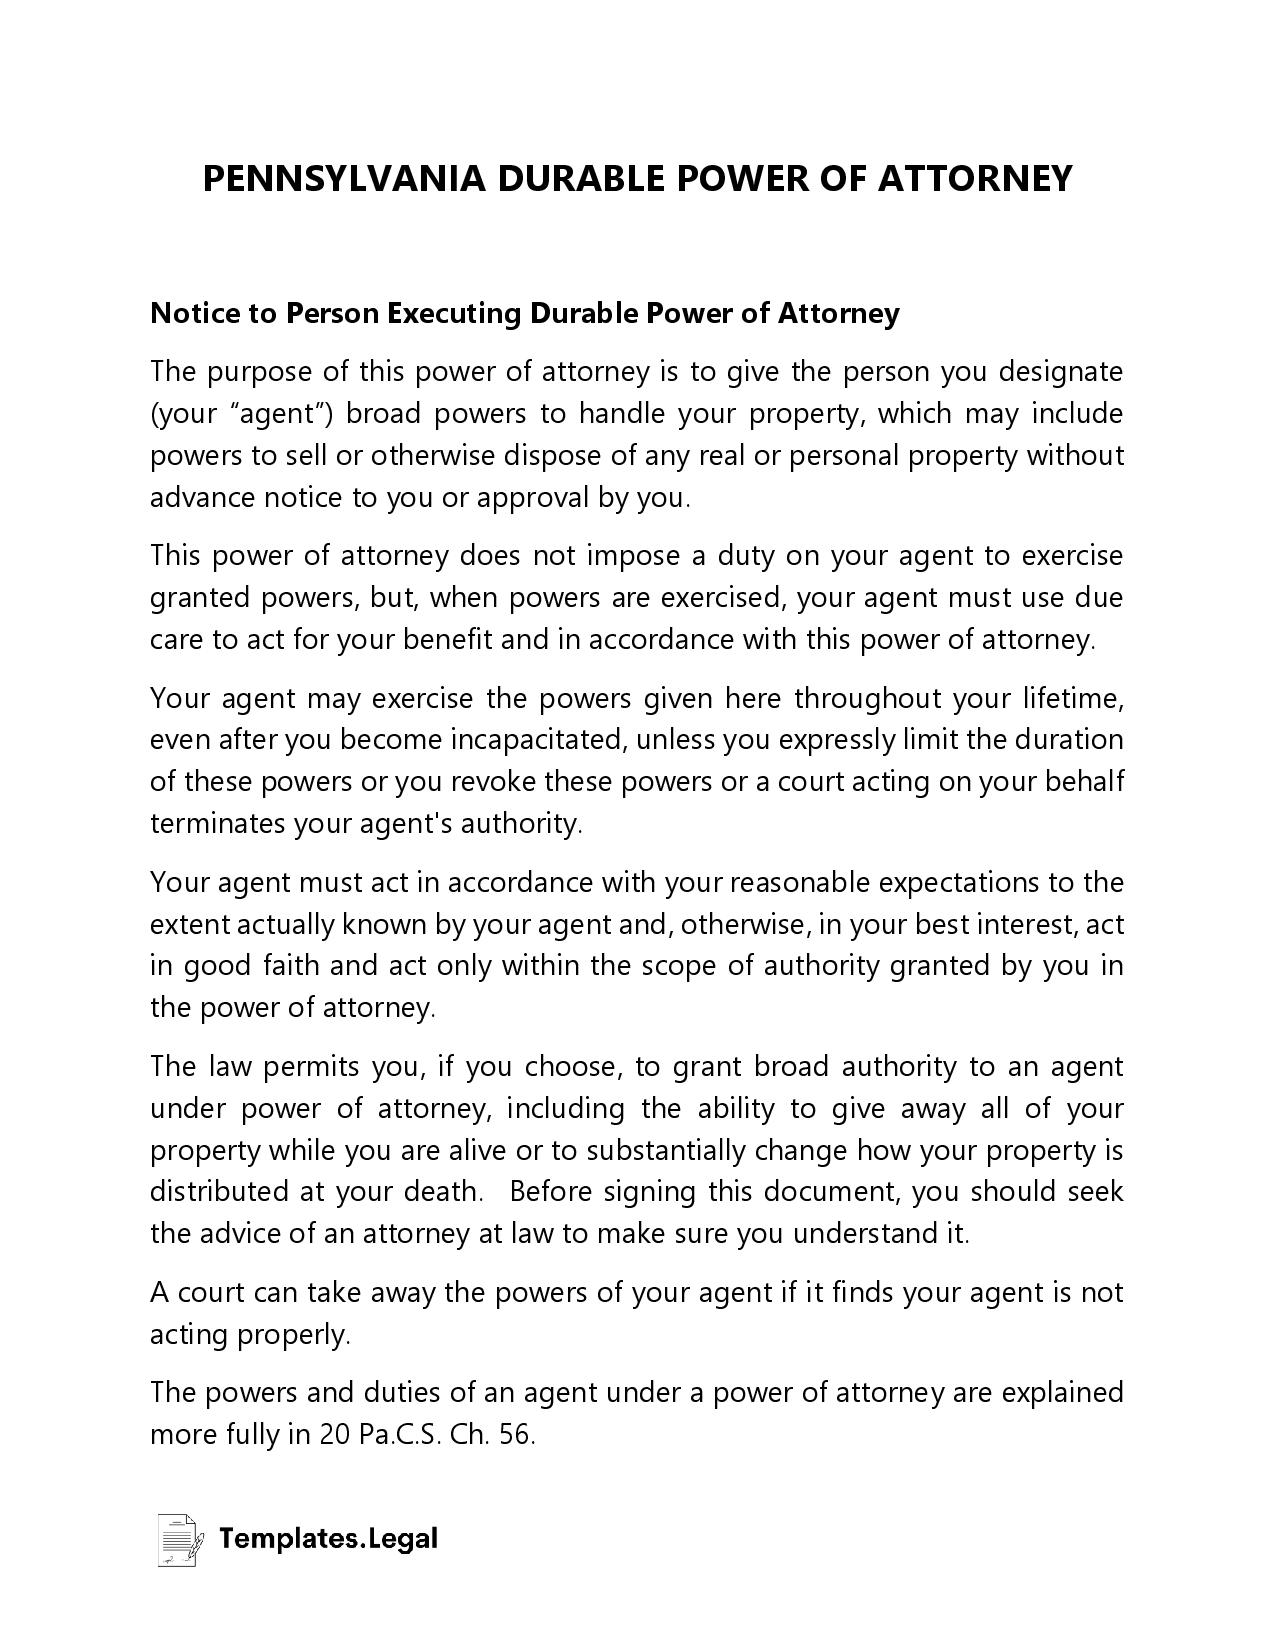 Pennsylvania Durable Power of Attorney - Templates.Legal